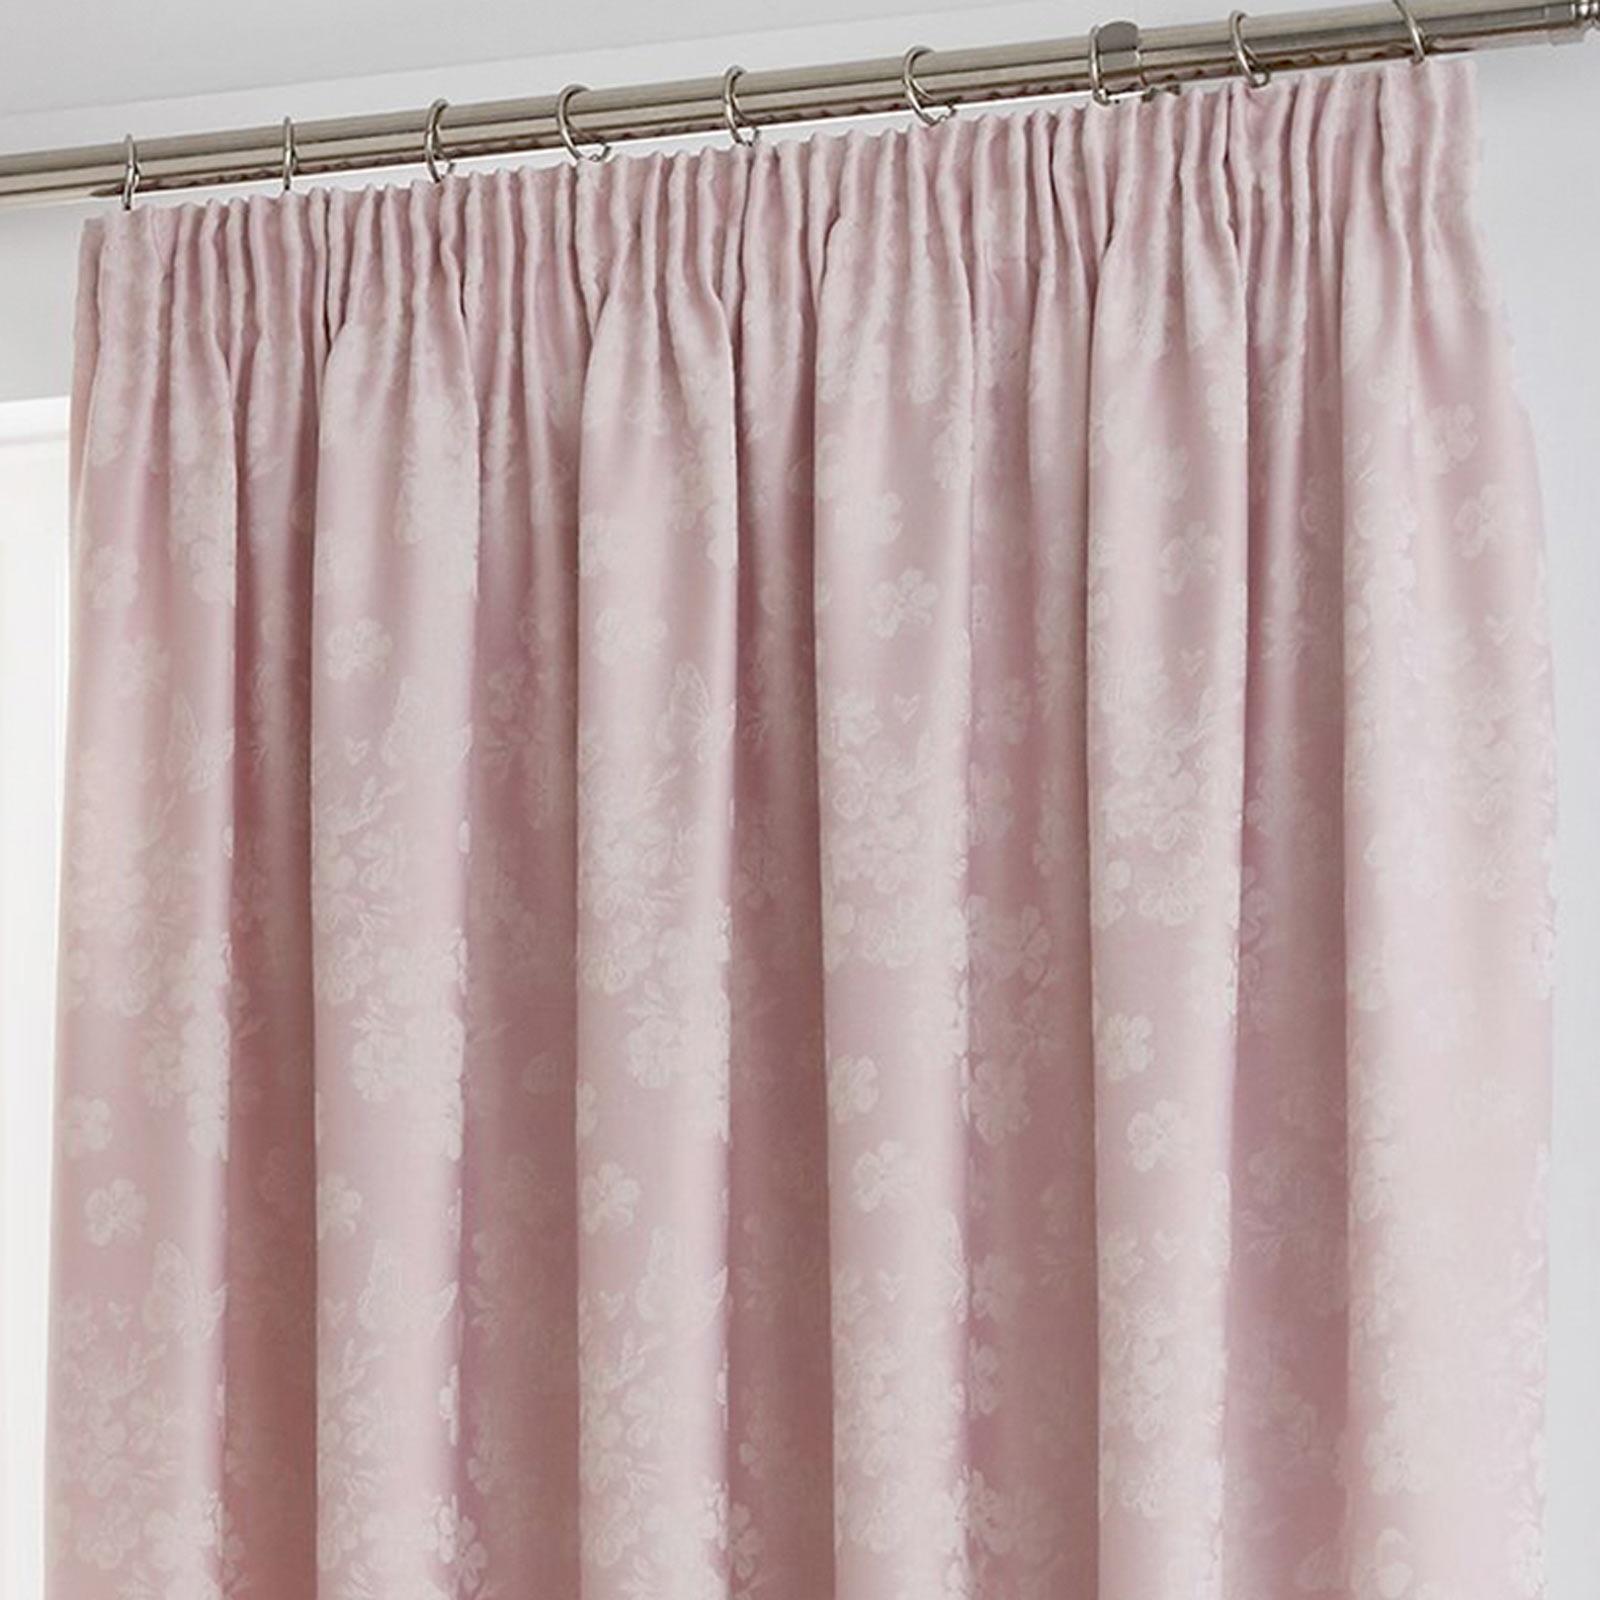 Fundas-de-Edredon-Rosa-Blush-Jacquard-Floral-Cubierta-Del-Edredon-Conjuntos-de-Ropa-de-cama-de-lujo miniatura 27